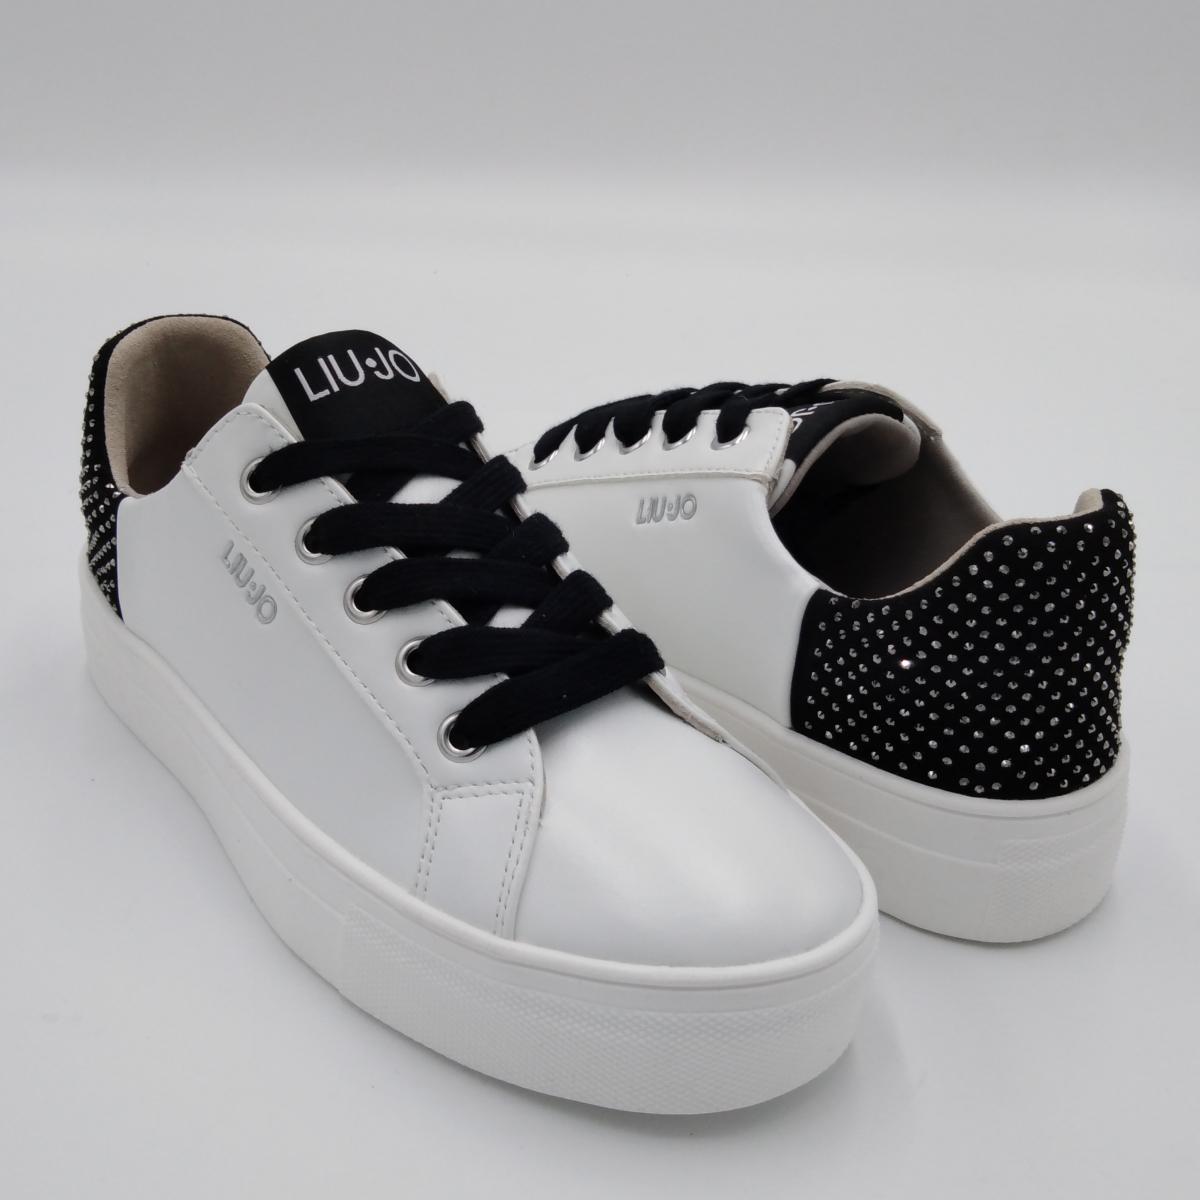 Liu Jo Alicia 144 -Sneaker...